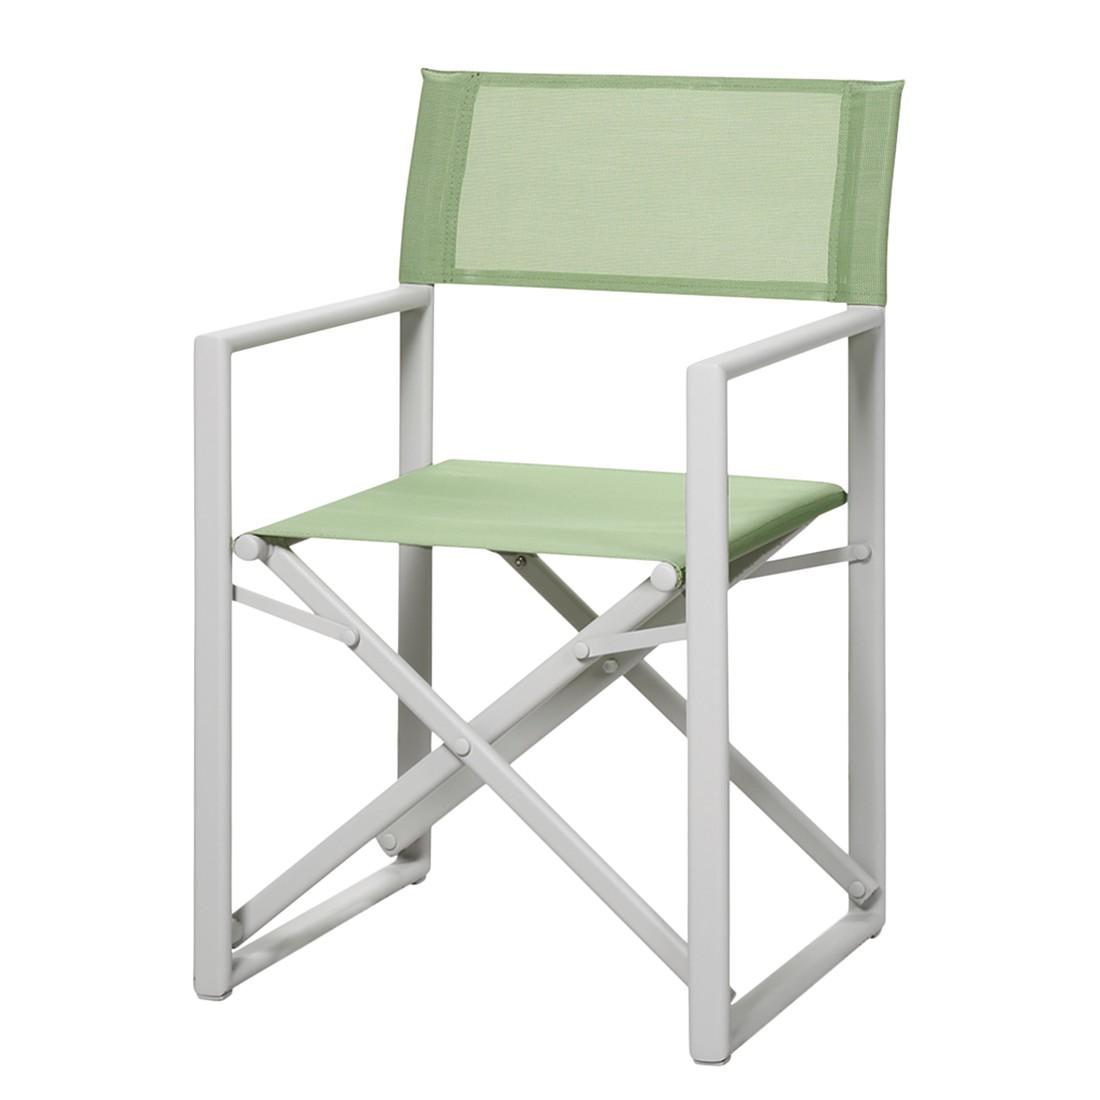 Home 24 - Chaise de jardin messina - aluminium / ergotex crème vert clair, best freizeitmöbel